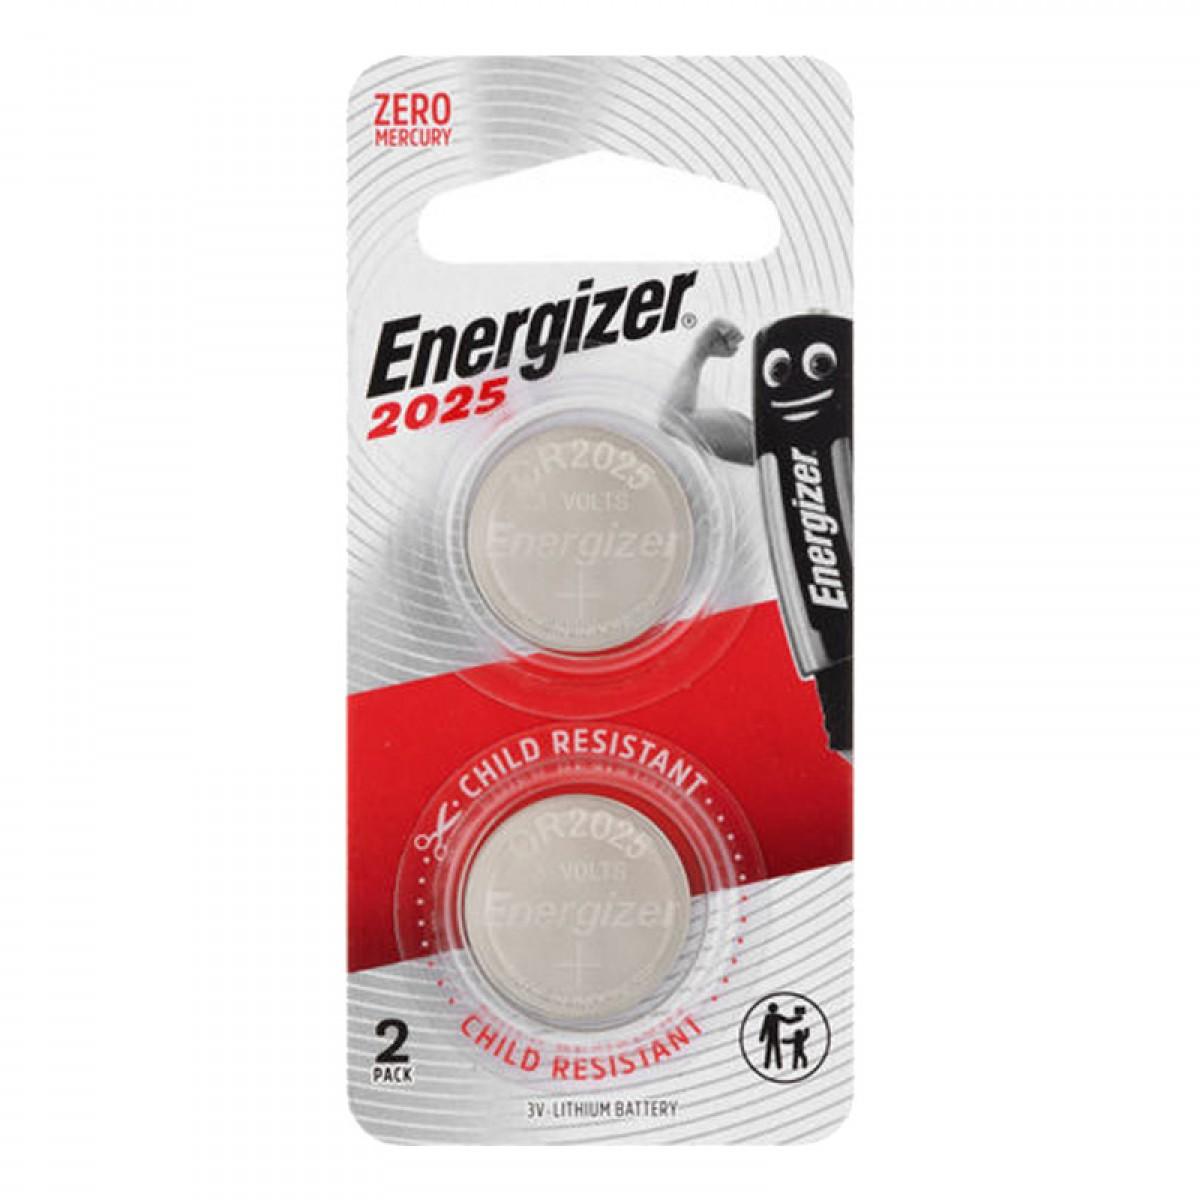 Energizer CR2025 3V Lithium Battery 2 Pack